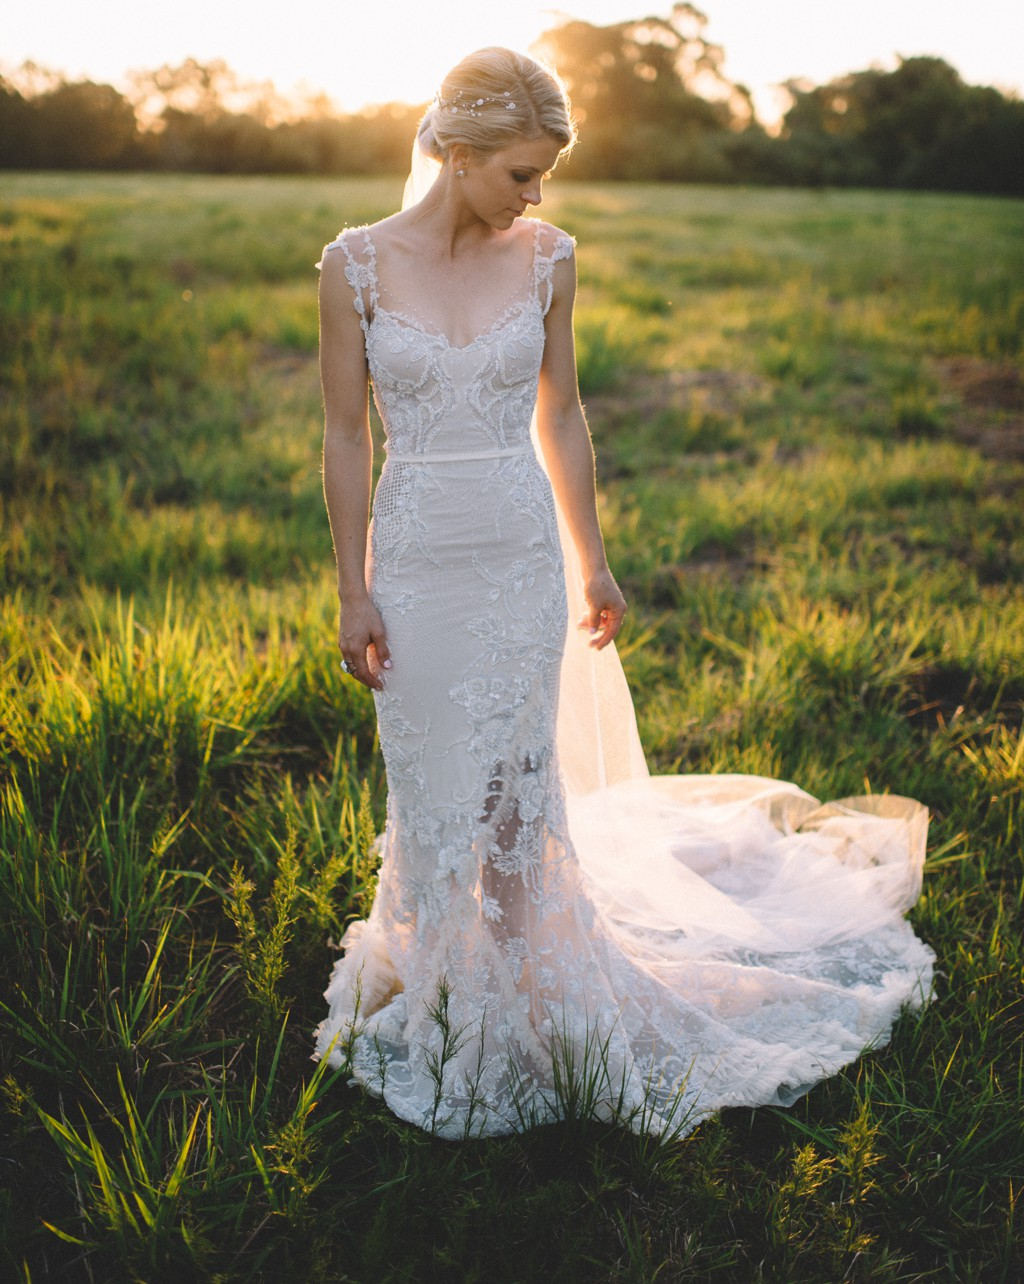 preowned wedding dresses au photo - 1